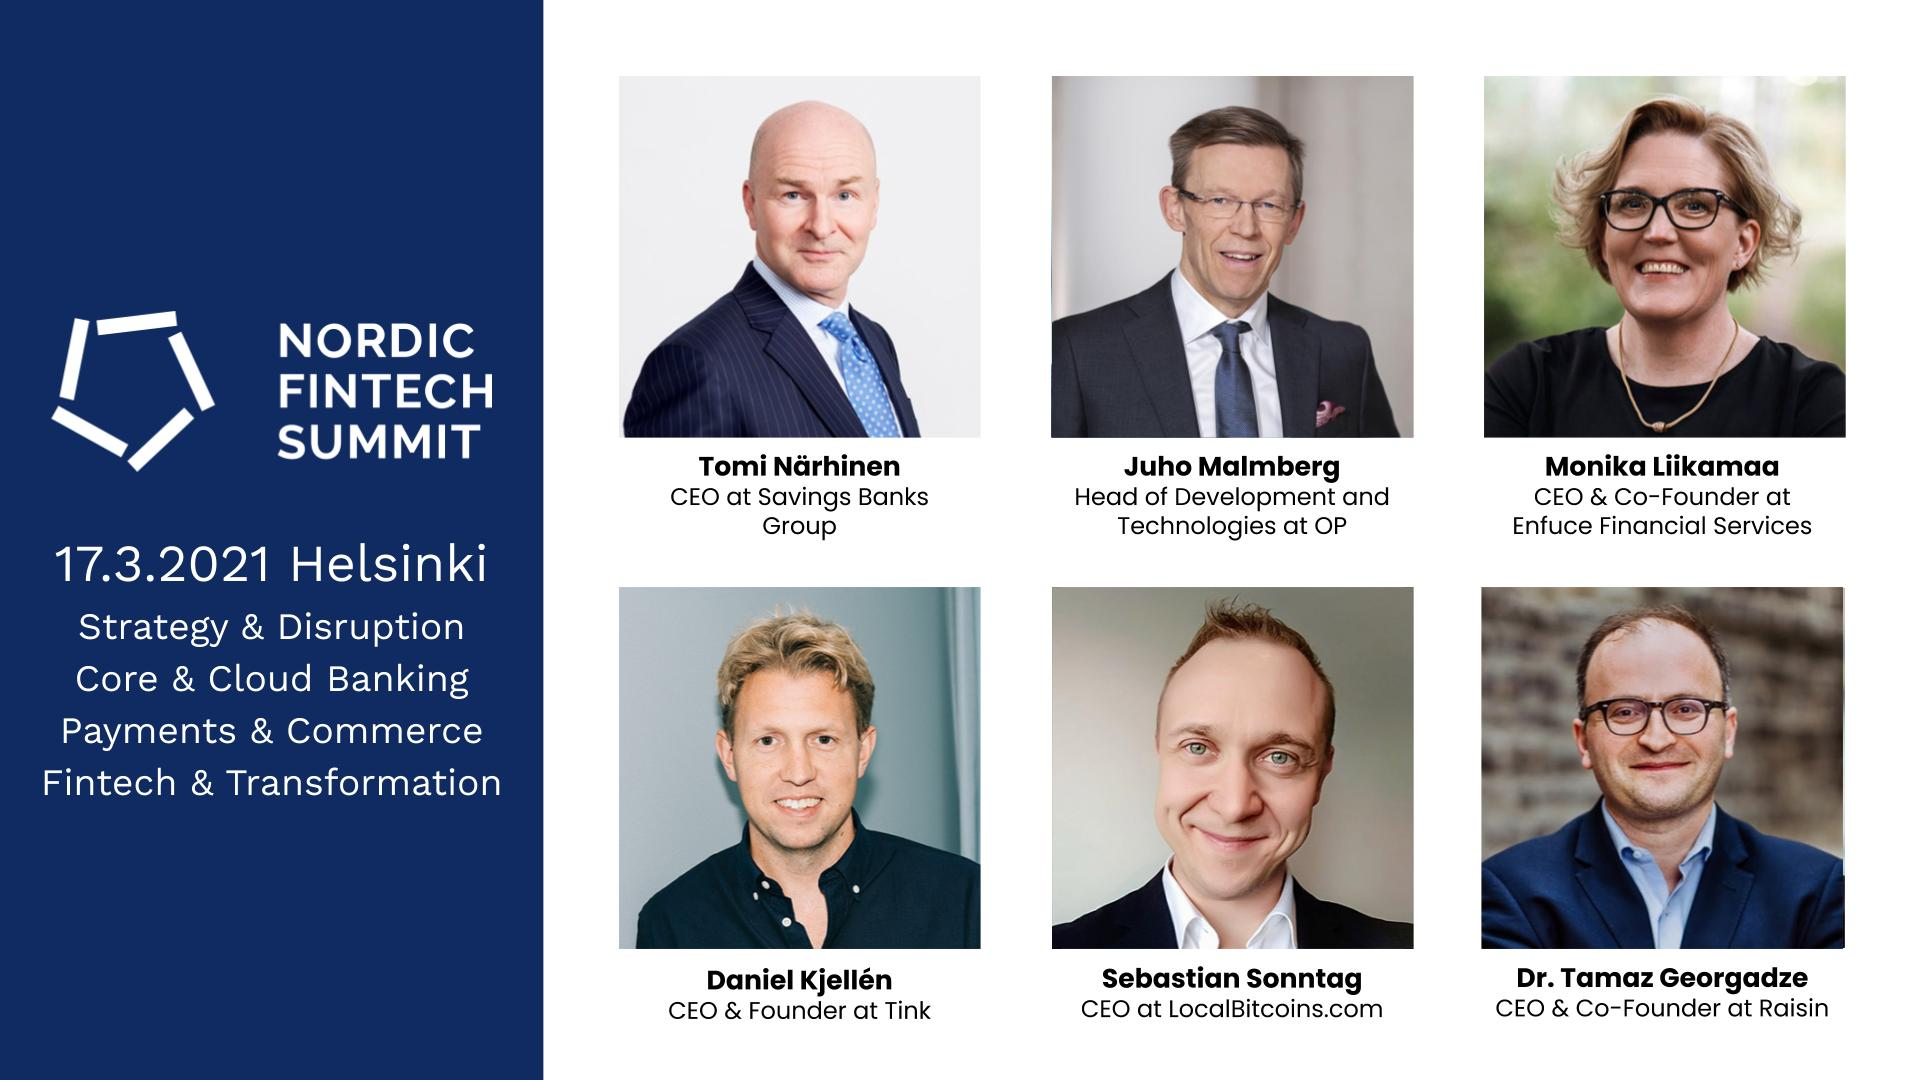 nordic fintech summit 2021